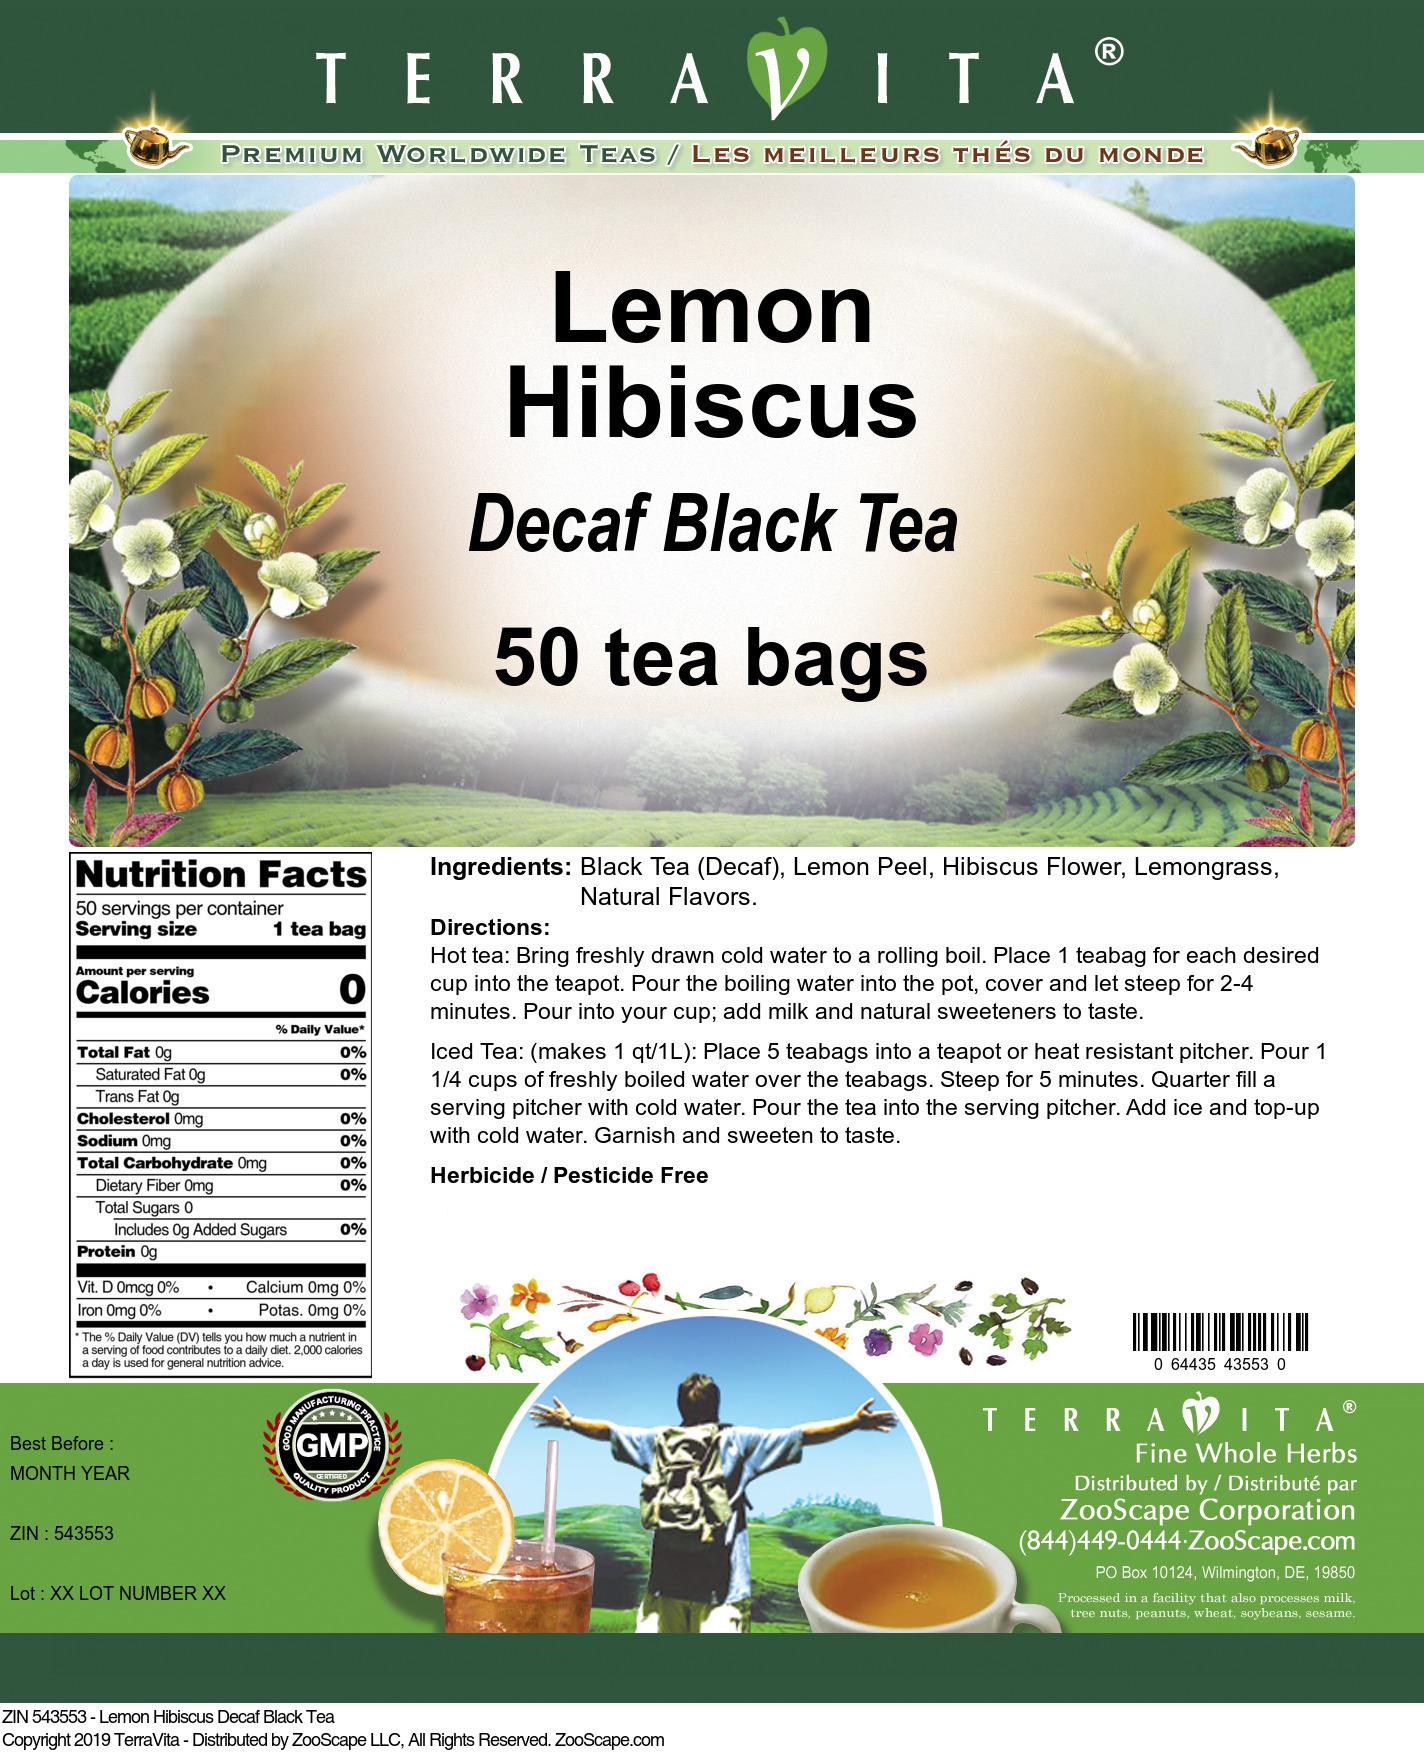 Lemon Hibiscus Decaf Black Tea